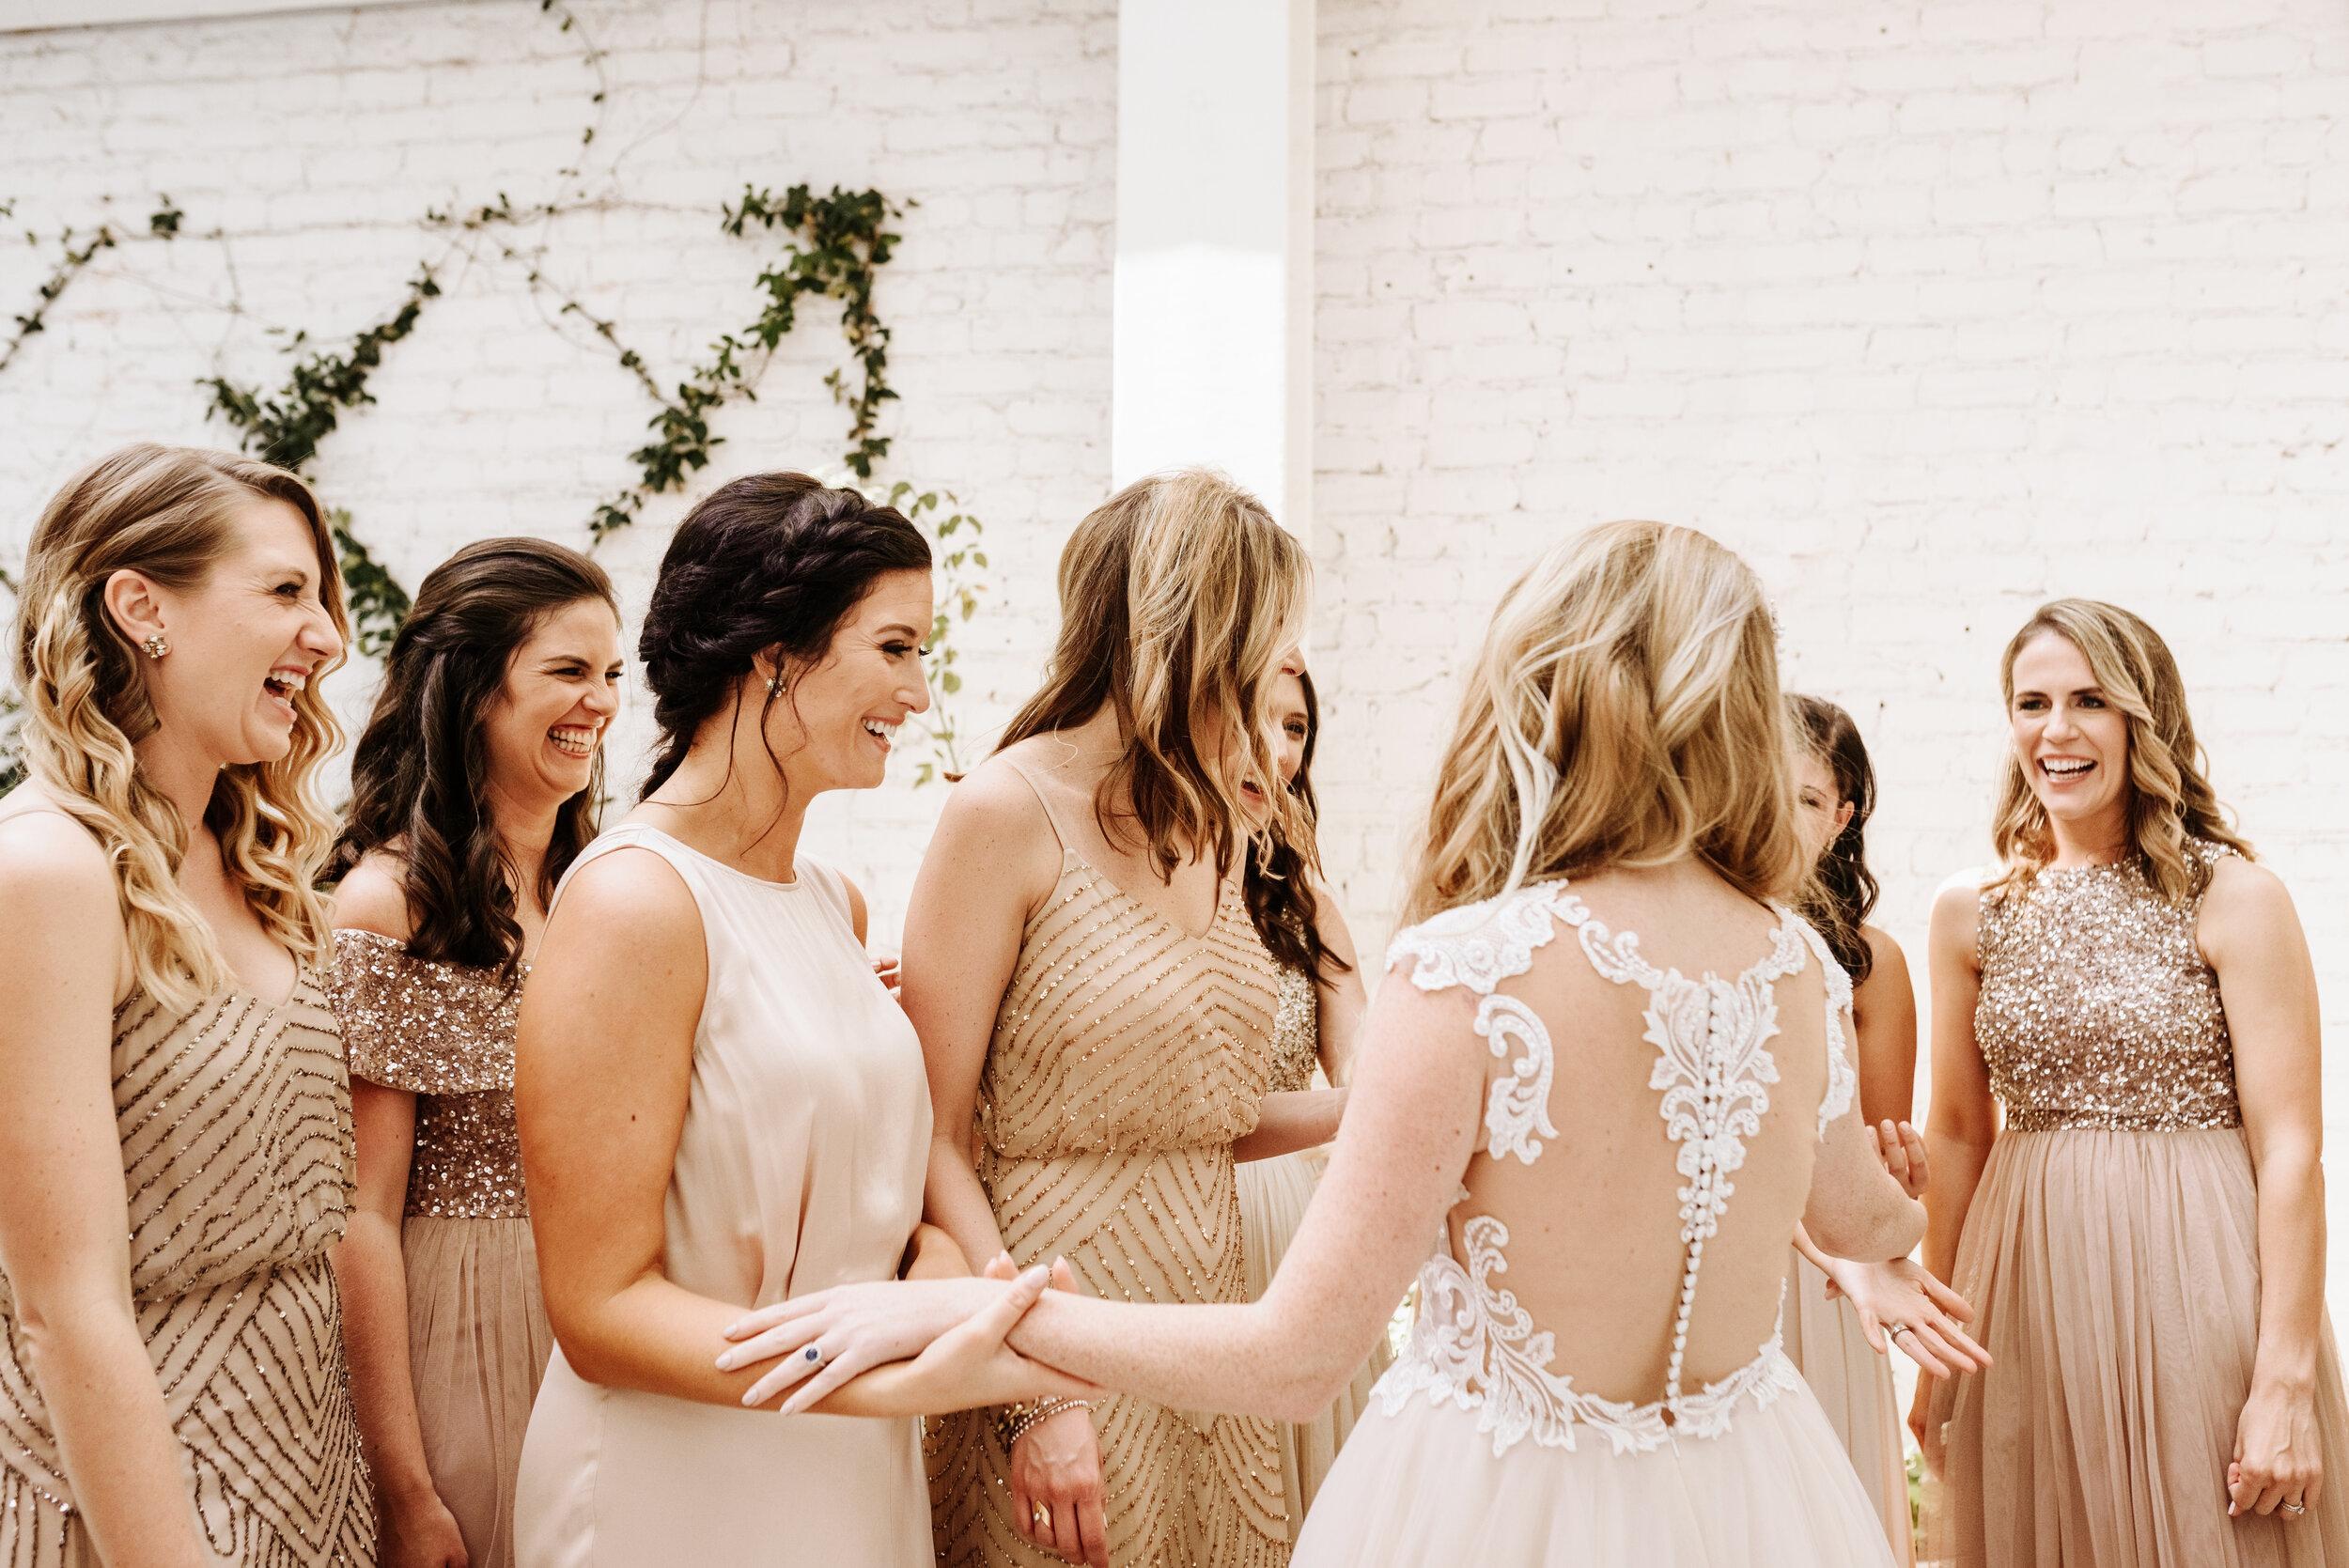 Cassie-Mrunal-Wedding-Quirk-Hotel-John-Marshall-Ballrooms-Richmond-Virginia-Photography-by-V-17.jpg